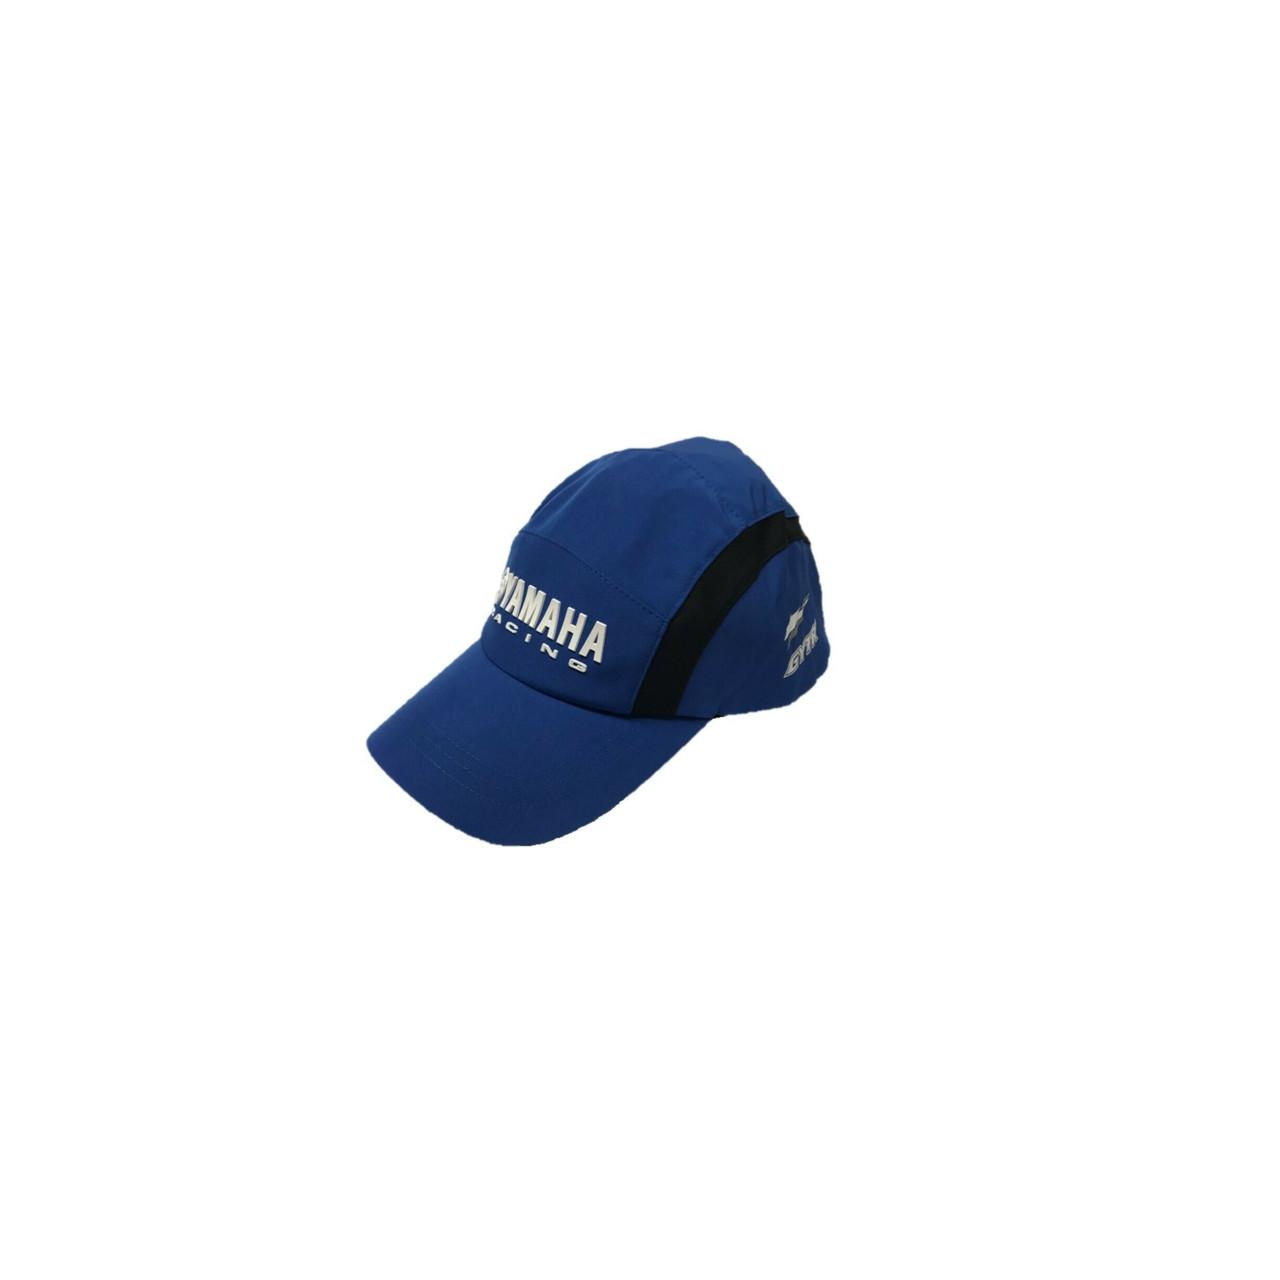 YAMAHA Casquette Paddock Bleu Yorkshire 2020